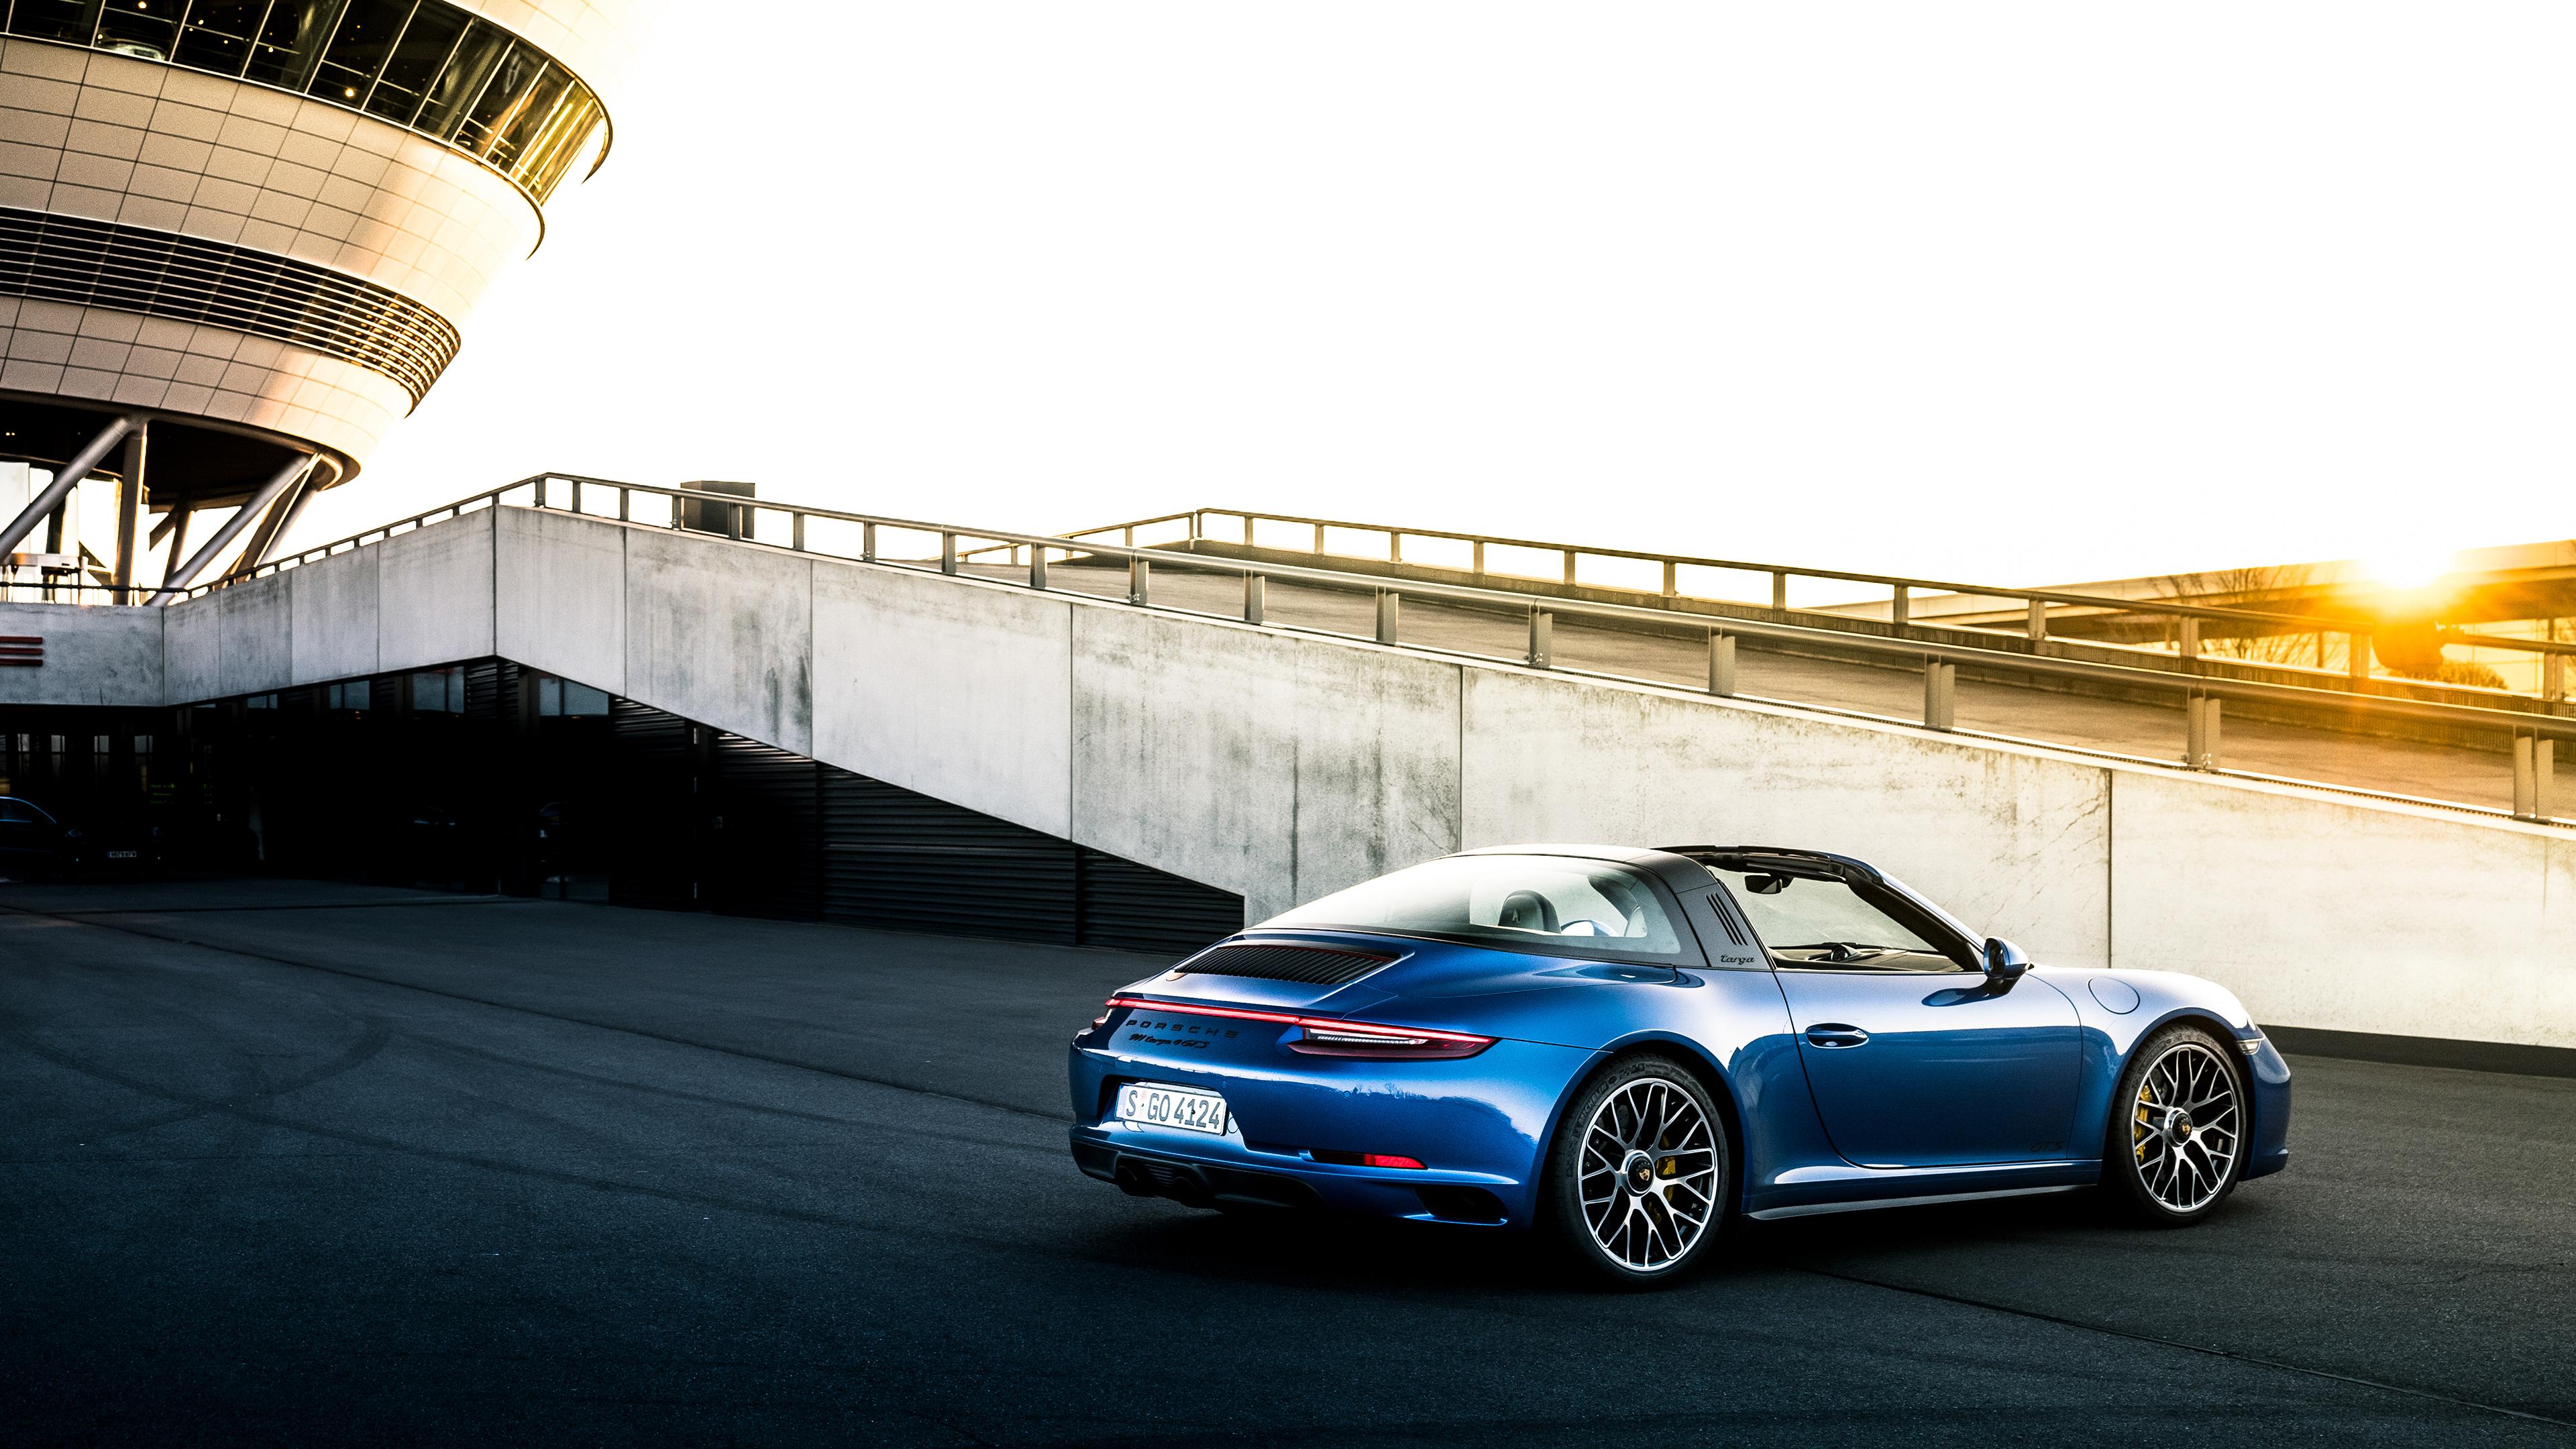 porsche 911 targa gts 4k 1546361849 - Porsche 911 Targa GTS 4k - porsche wallpapers, porsche 911 wallpapers, hd-wallpapers, cars wallpapers, behance wallpapers, artist wallpapers, 4k-wallpapers, 2018 cars wallpapers